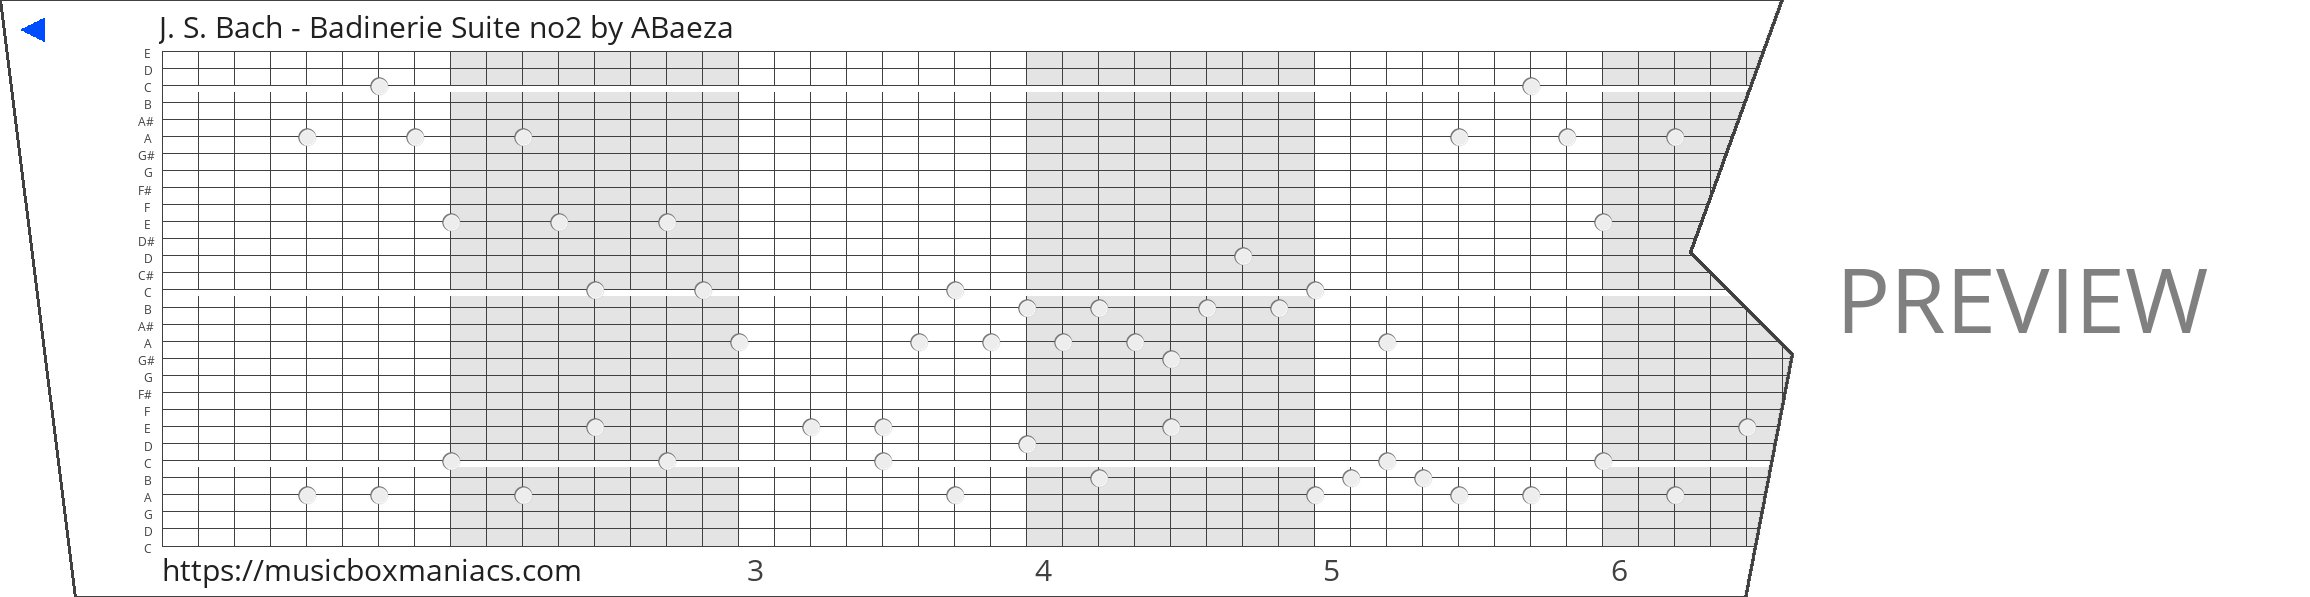 J. S. Bach - Badinerie Suite no2 30 note music box paper strip